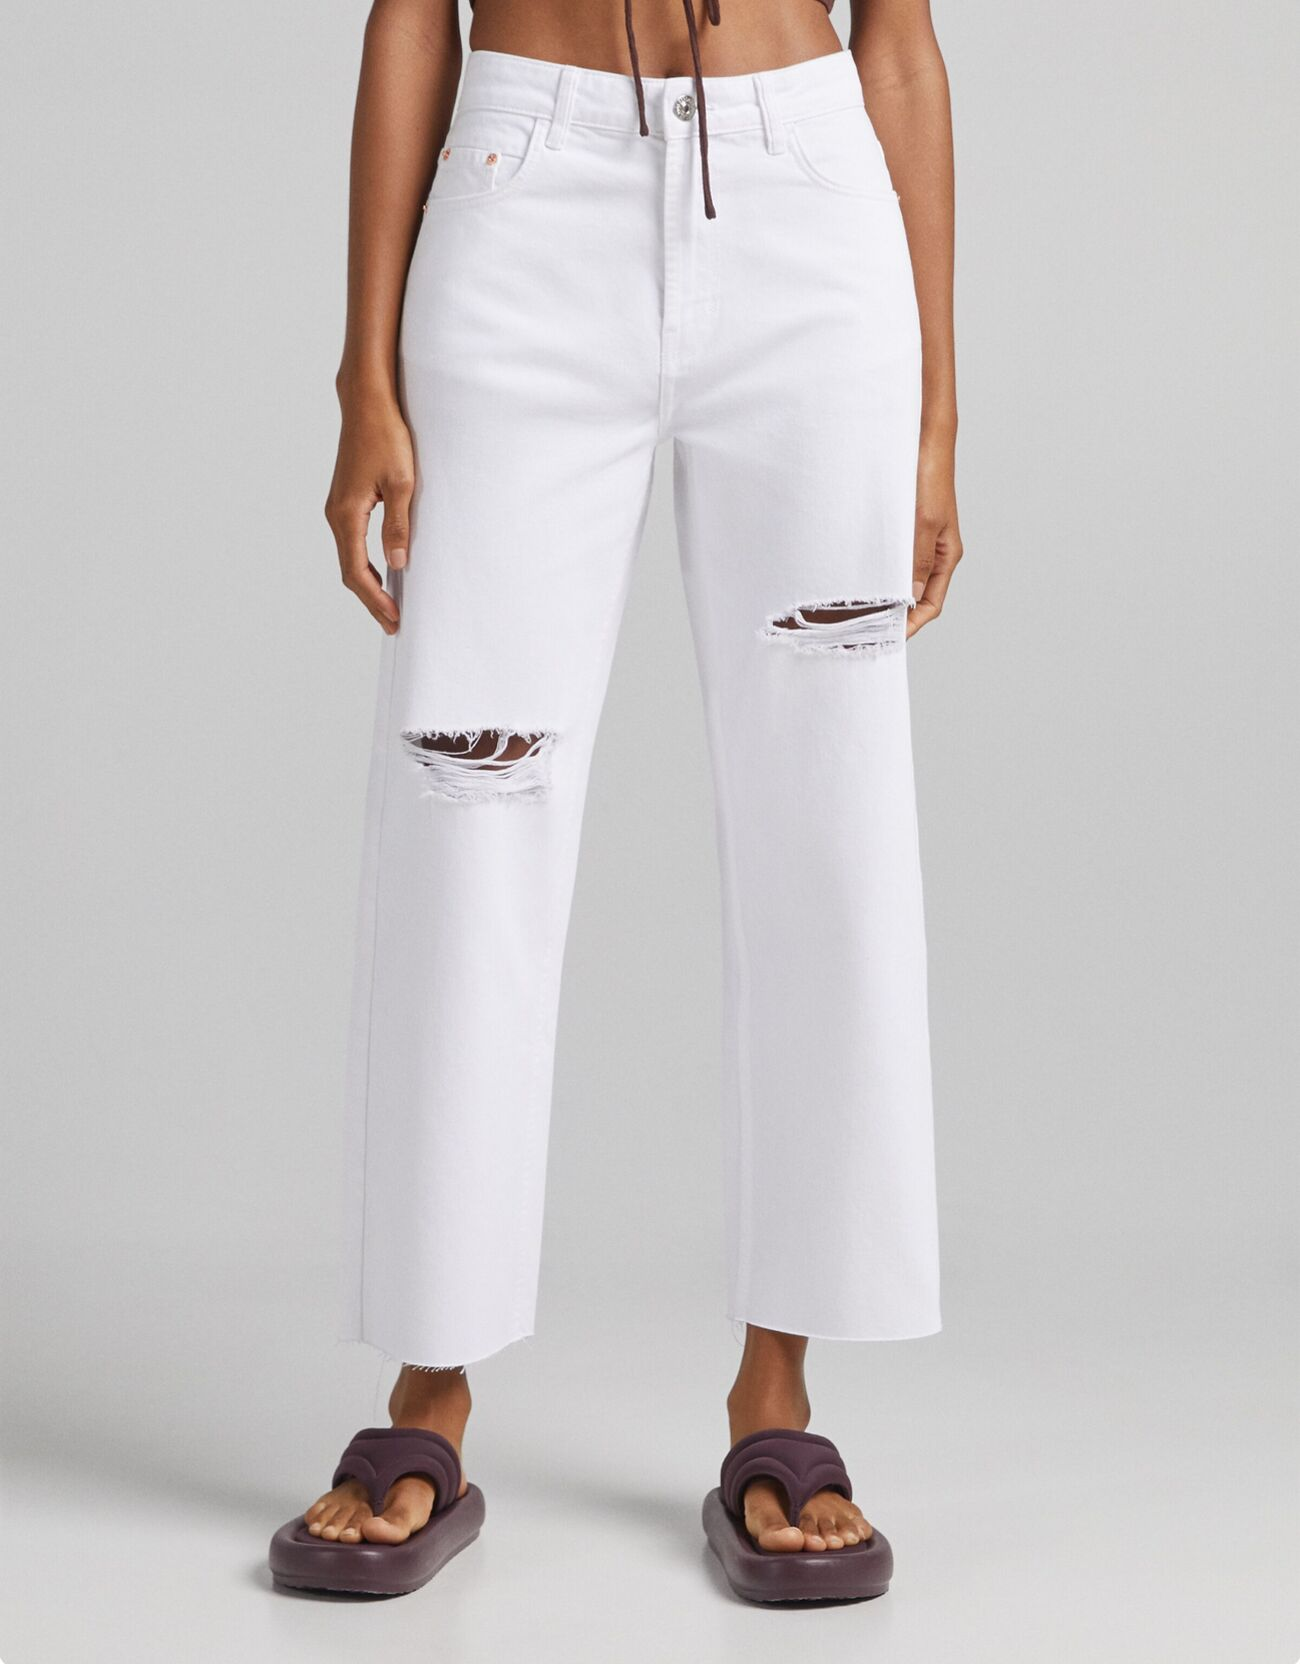 Bershka Pantalón Sarga Straight Mujer 44 Blanco